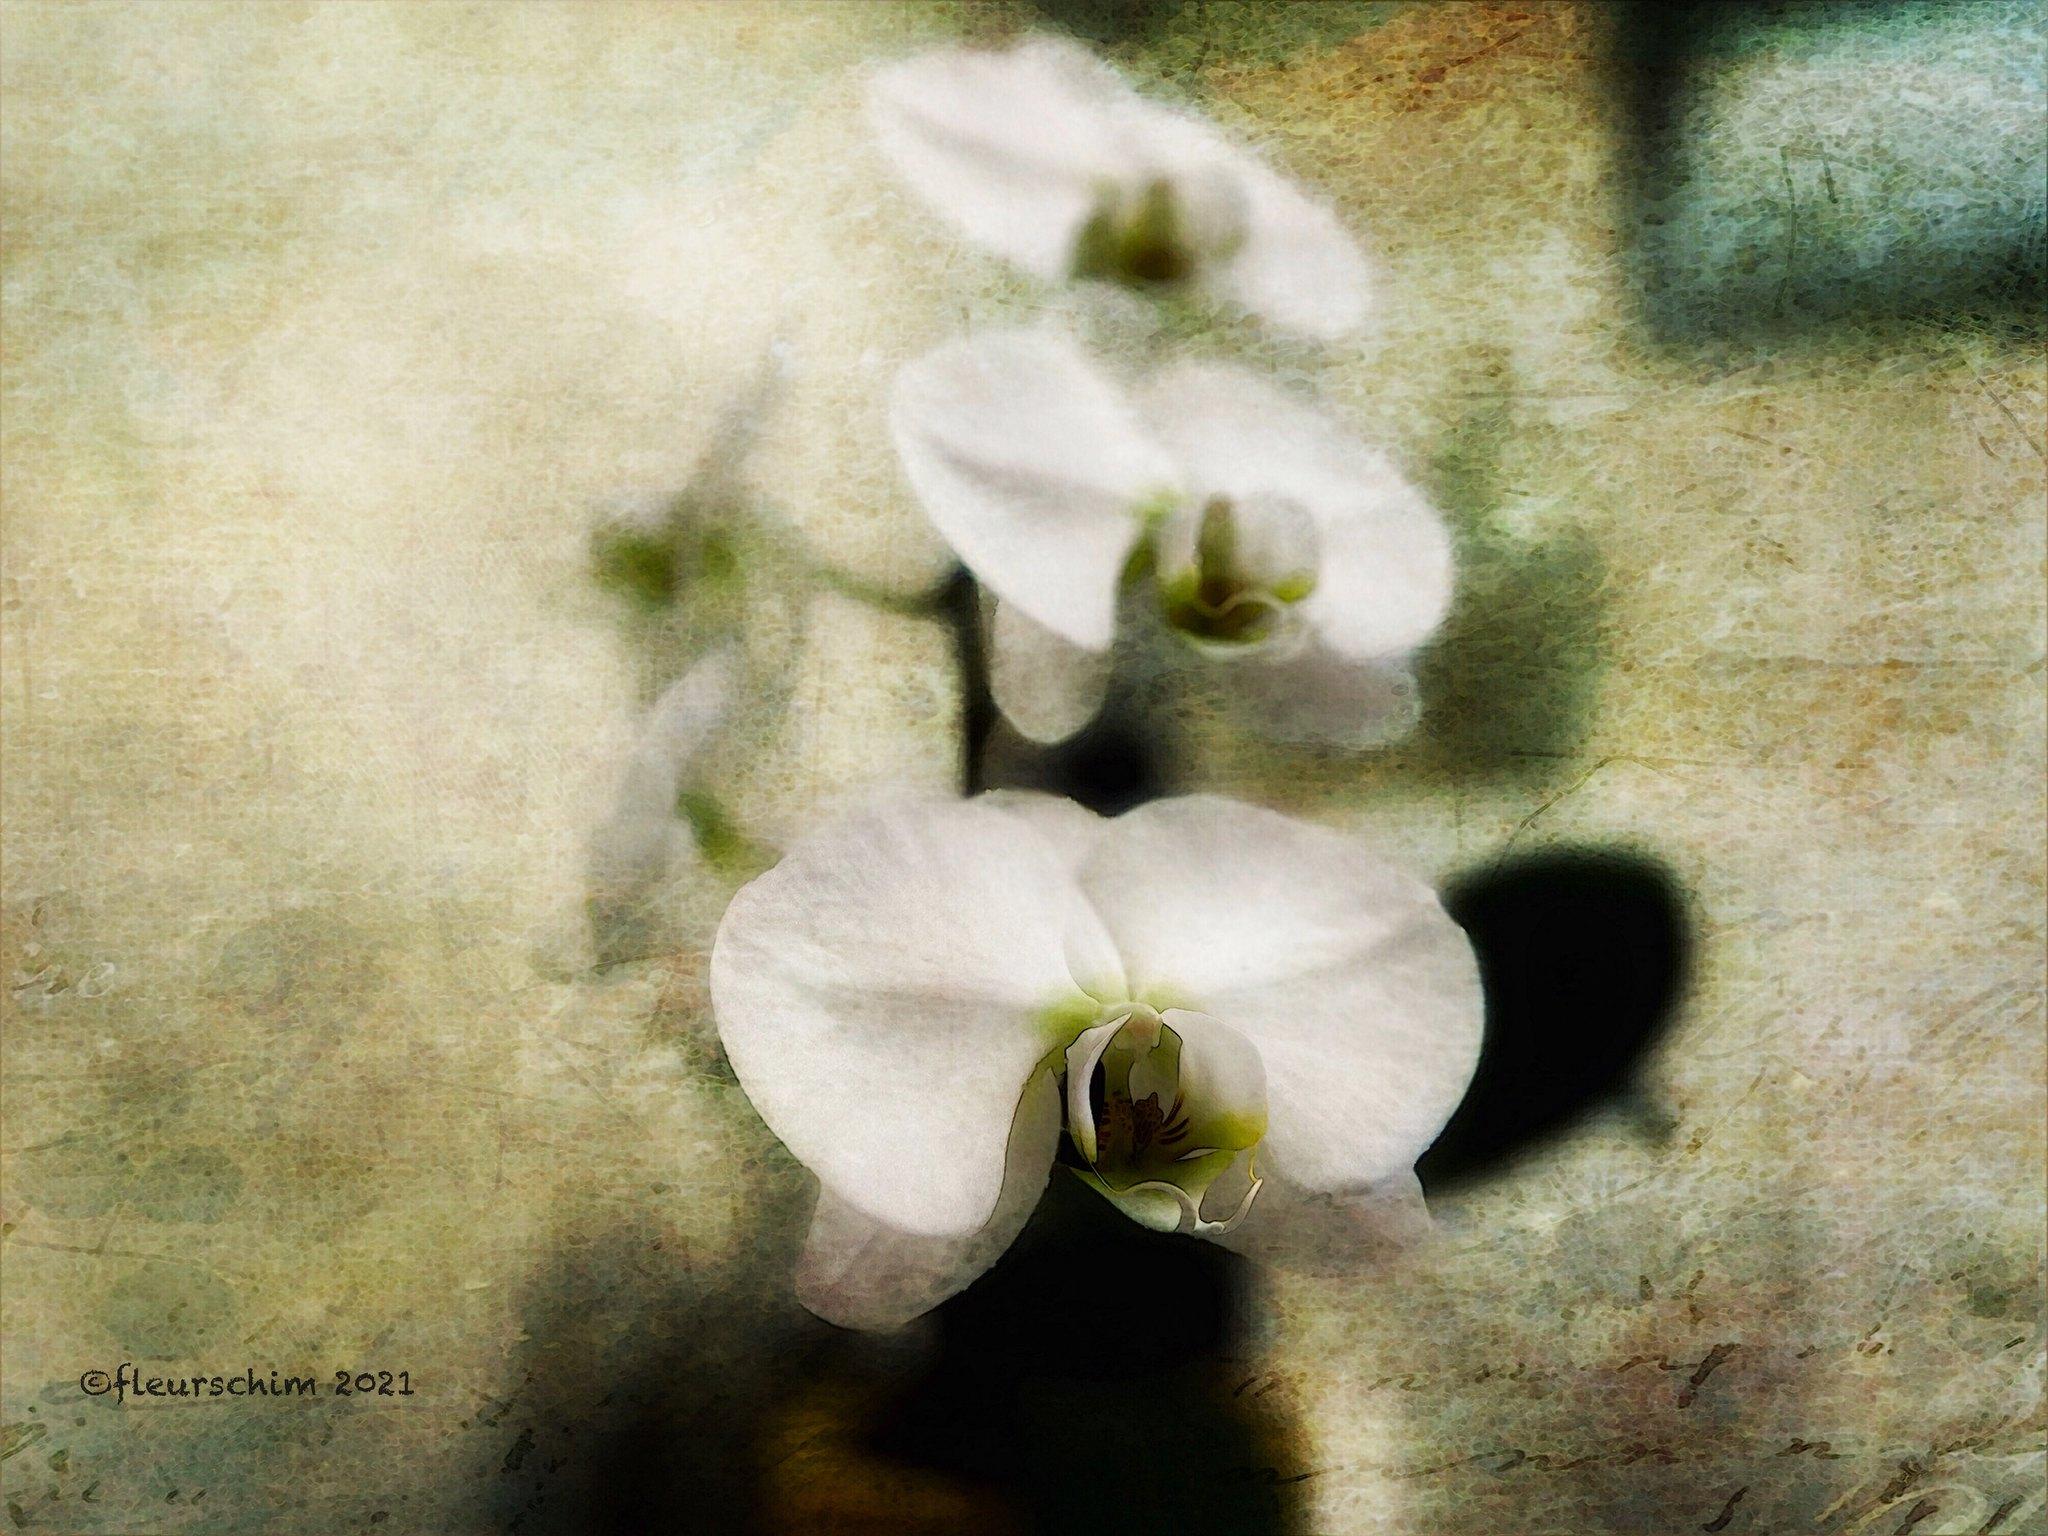 Visions © Fleur Schim